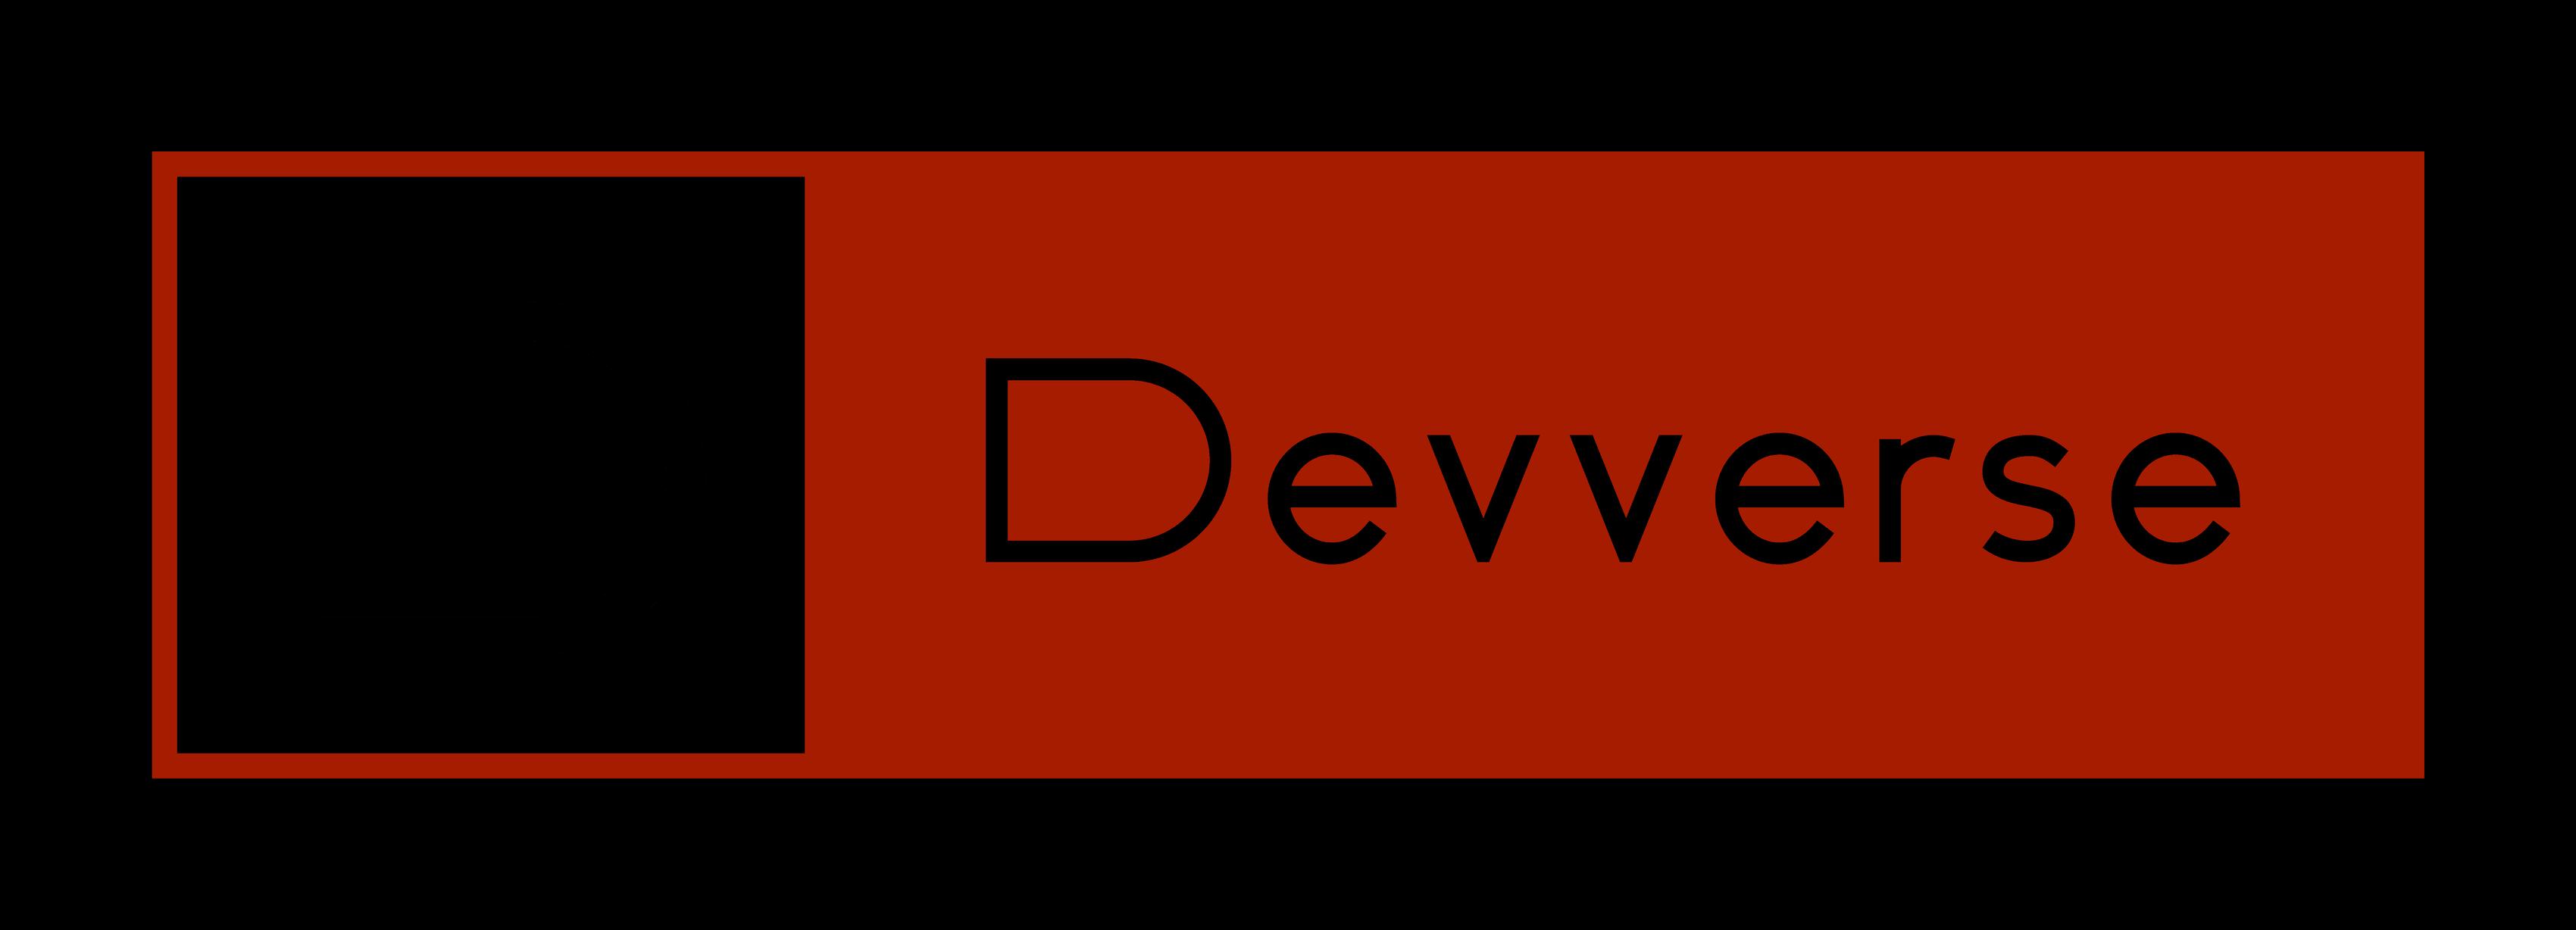 DEVVERSE